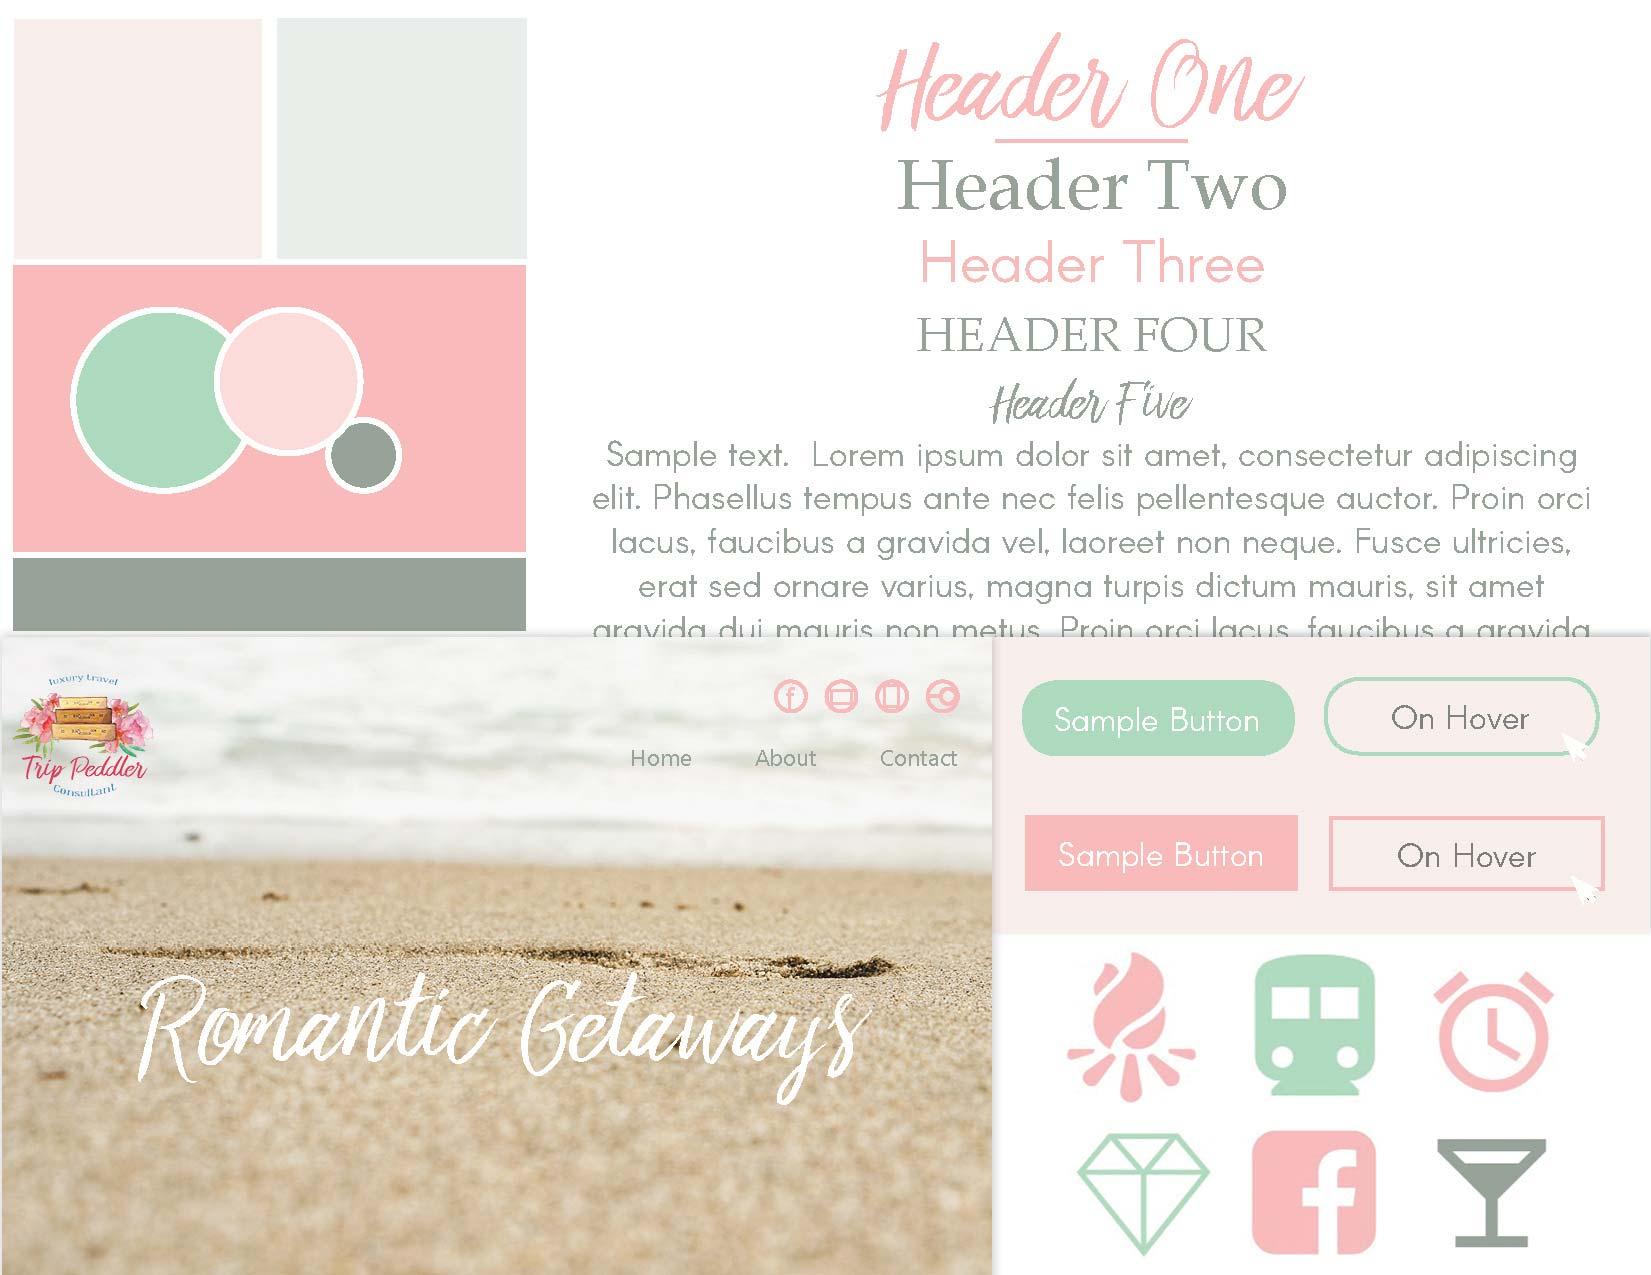 Website Design Style Guide 2